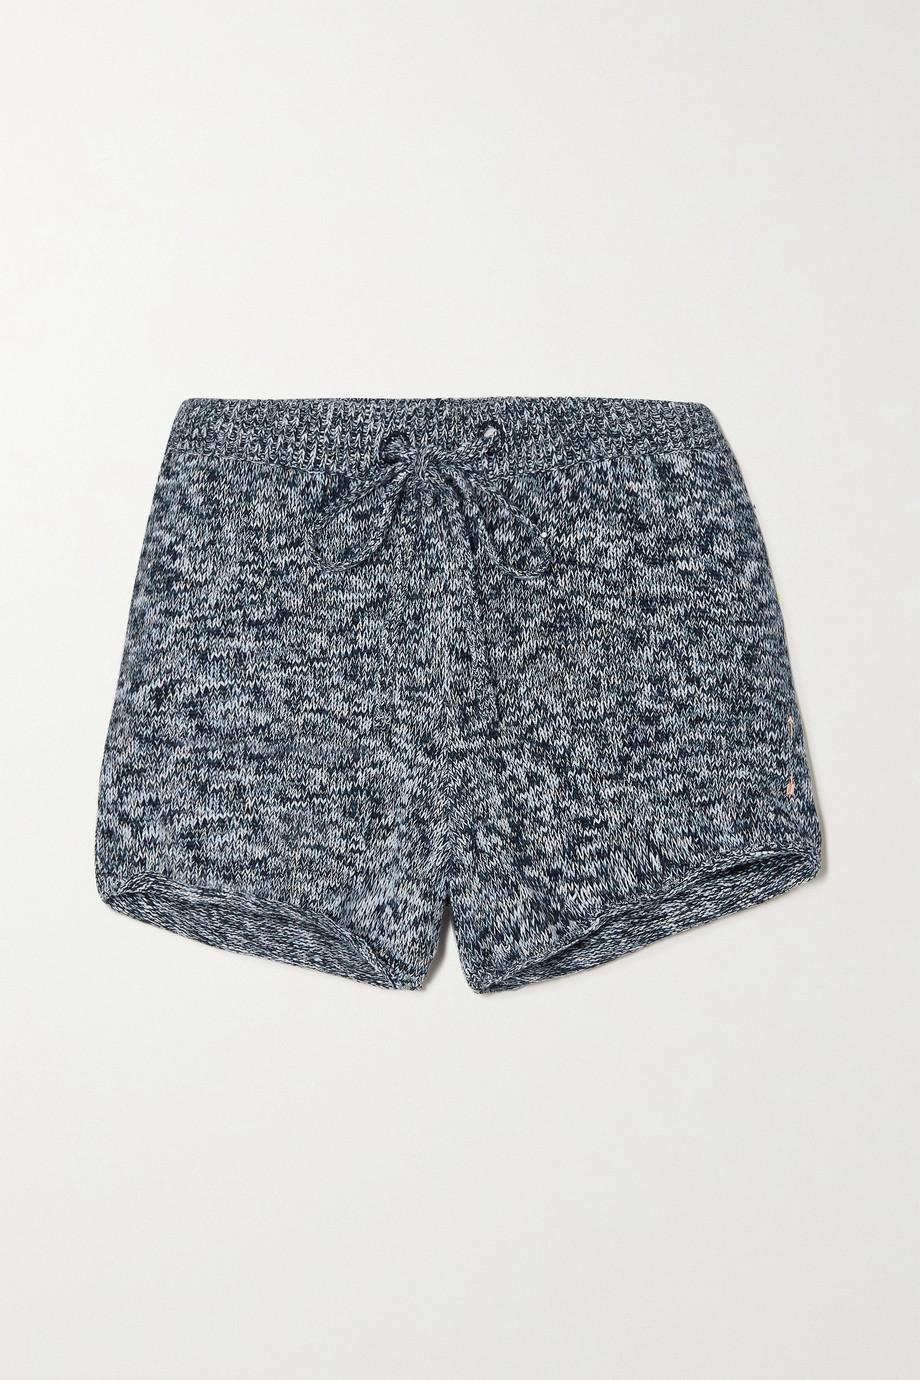 The Upside Spacerwalker cotton shorts